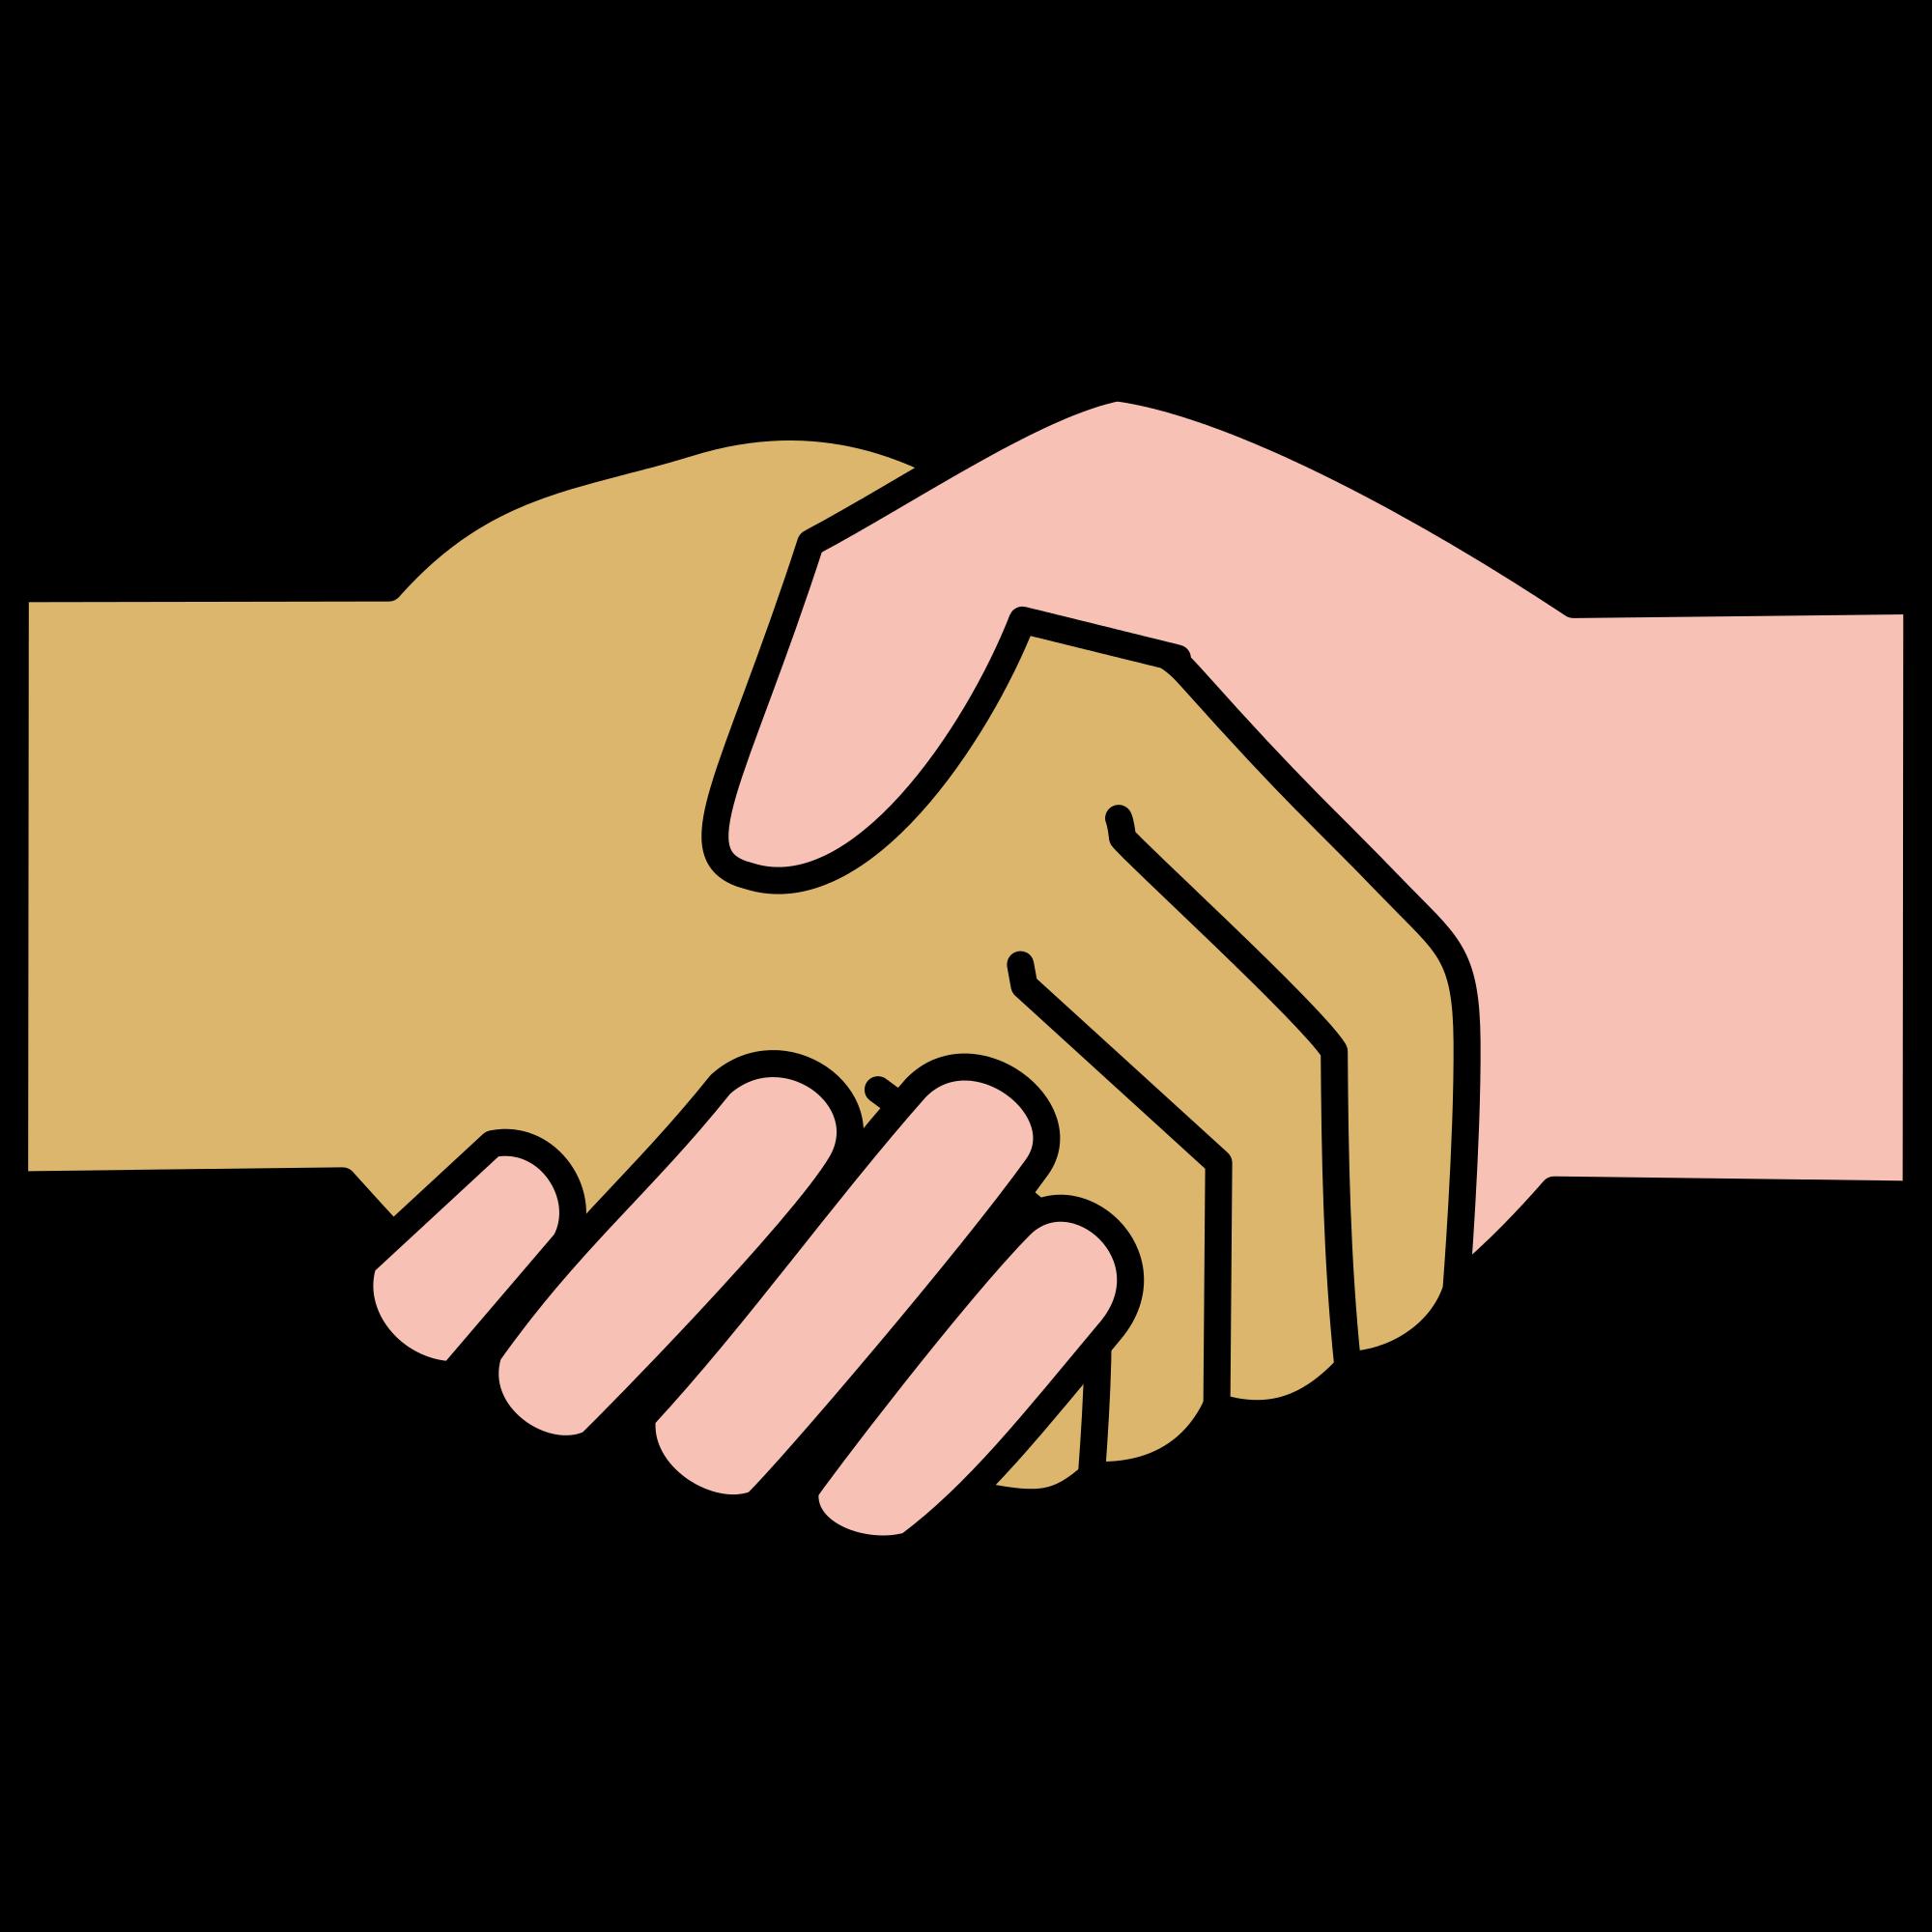 File icon svg wikimedia. Handshake clipart drawn